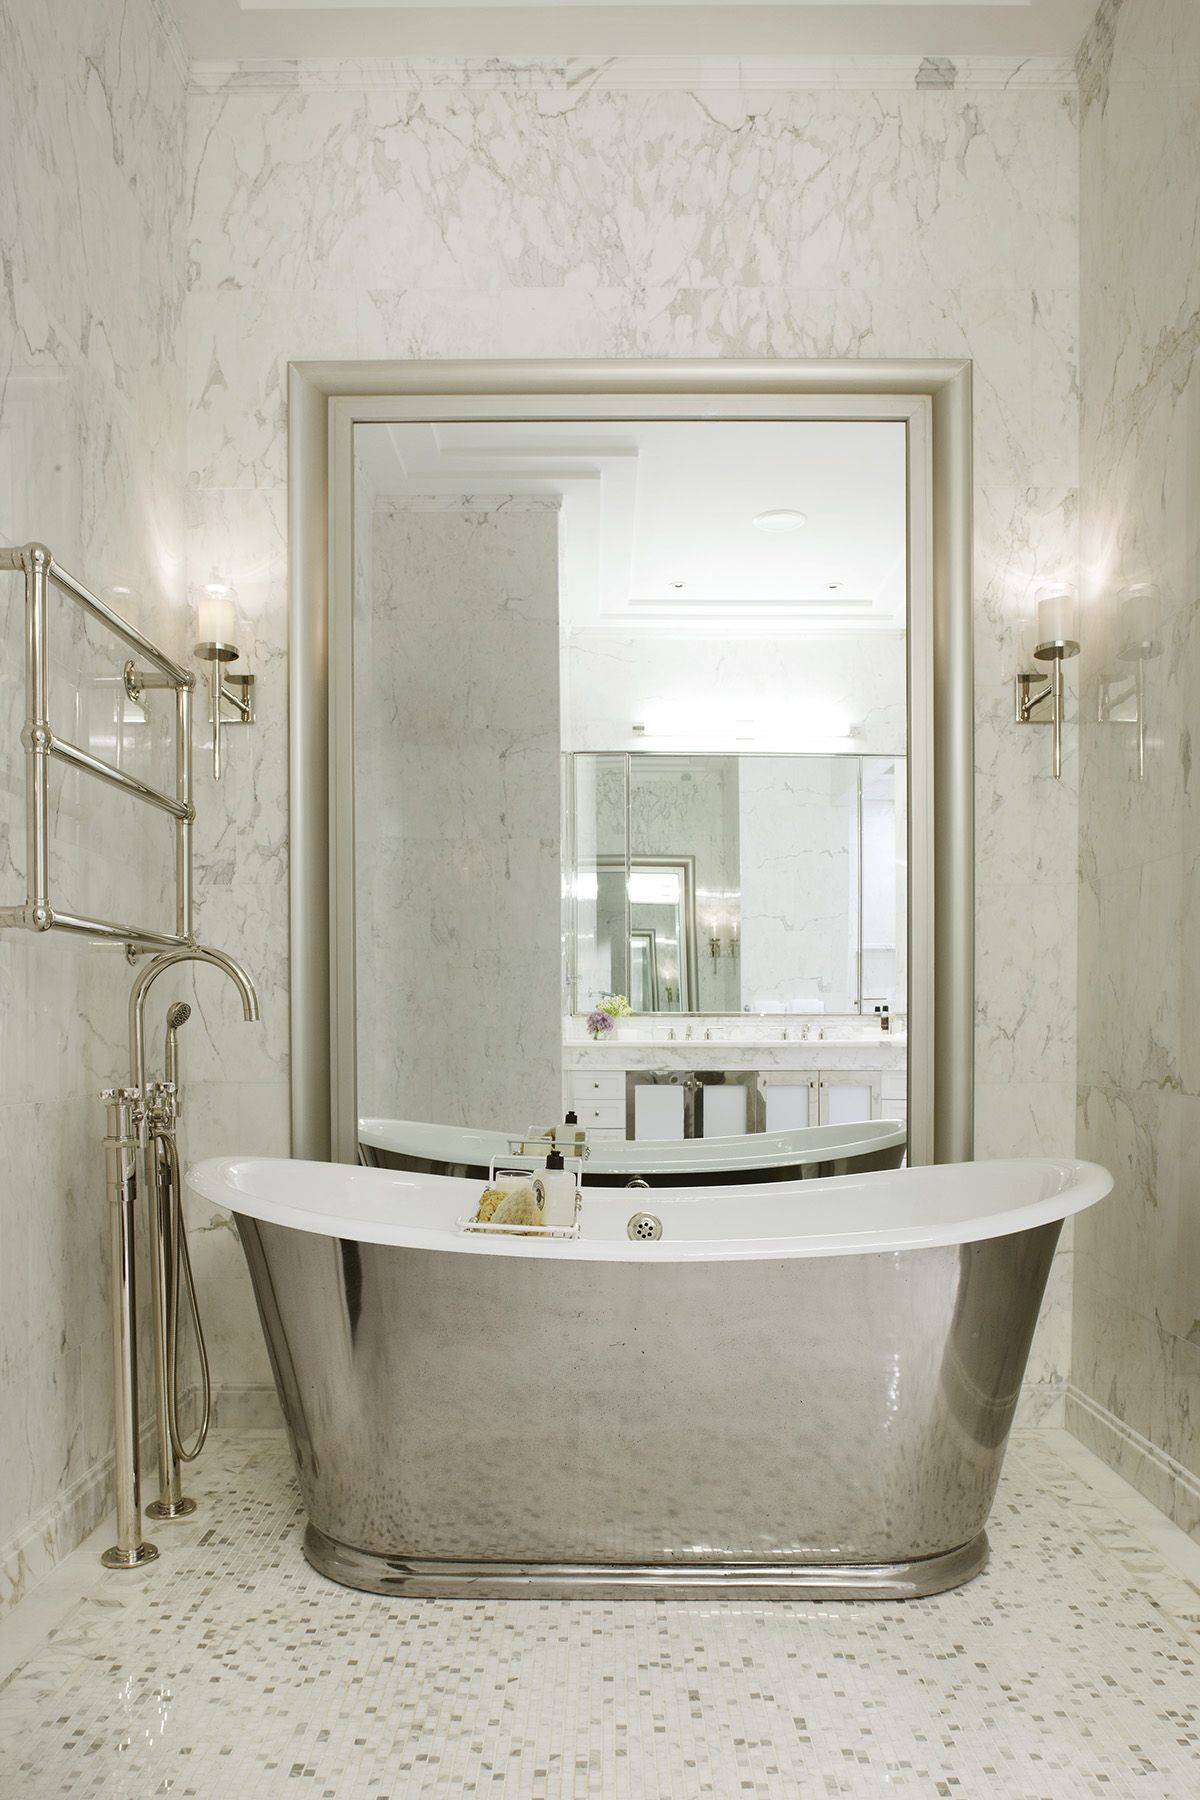 Bath. Free-standing Polished Nickel Tub. Towel Warmer